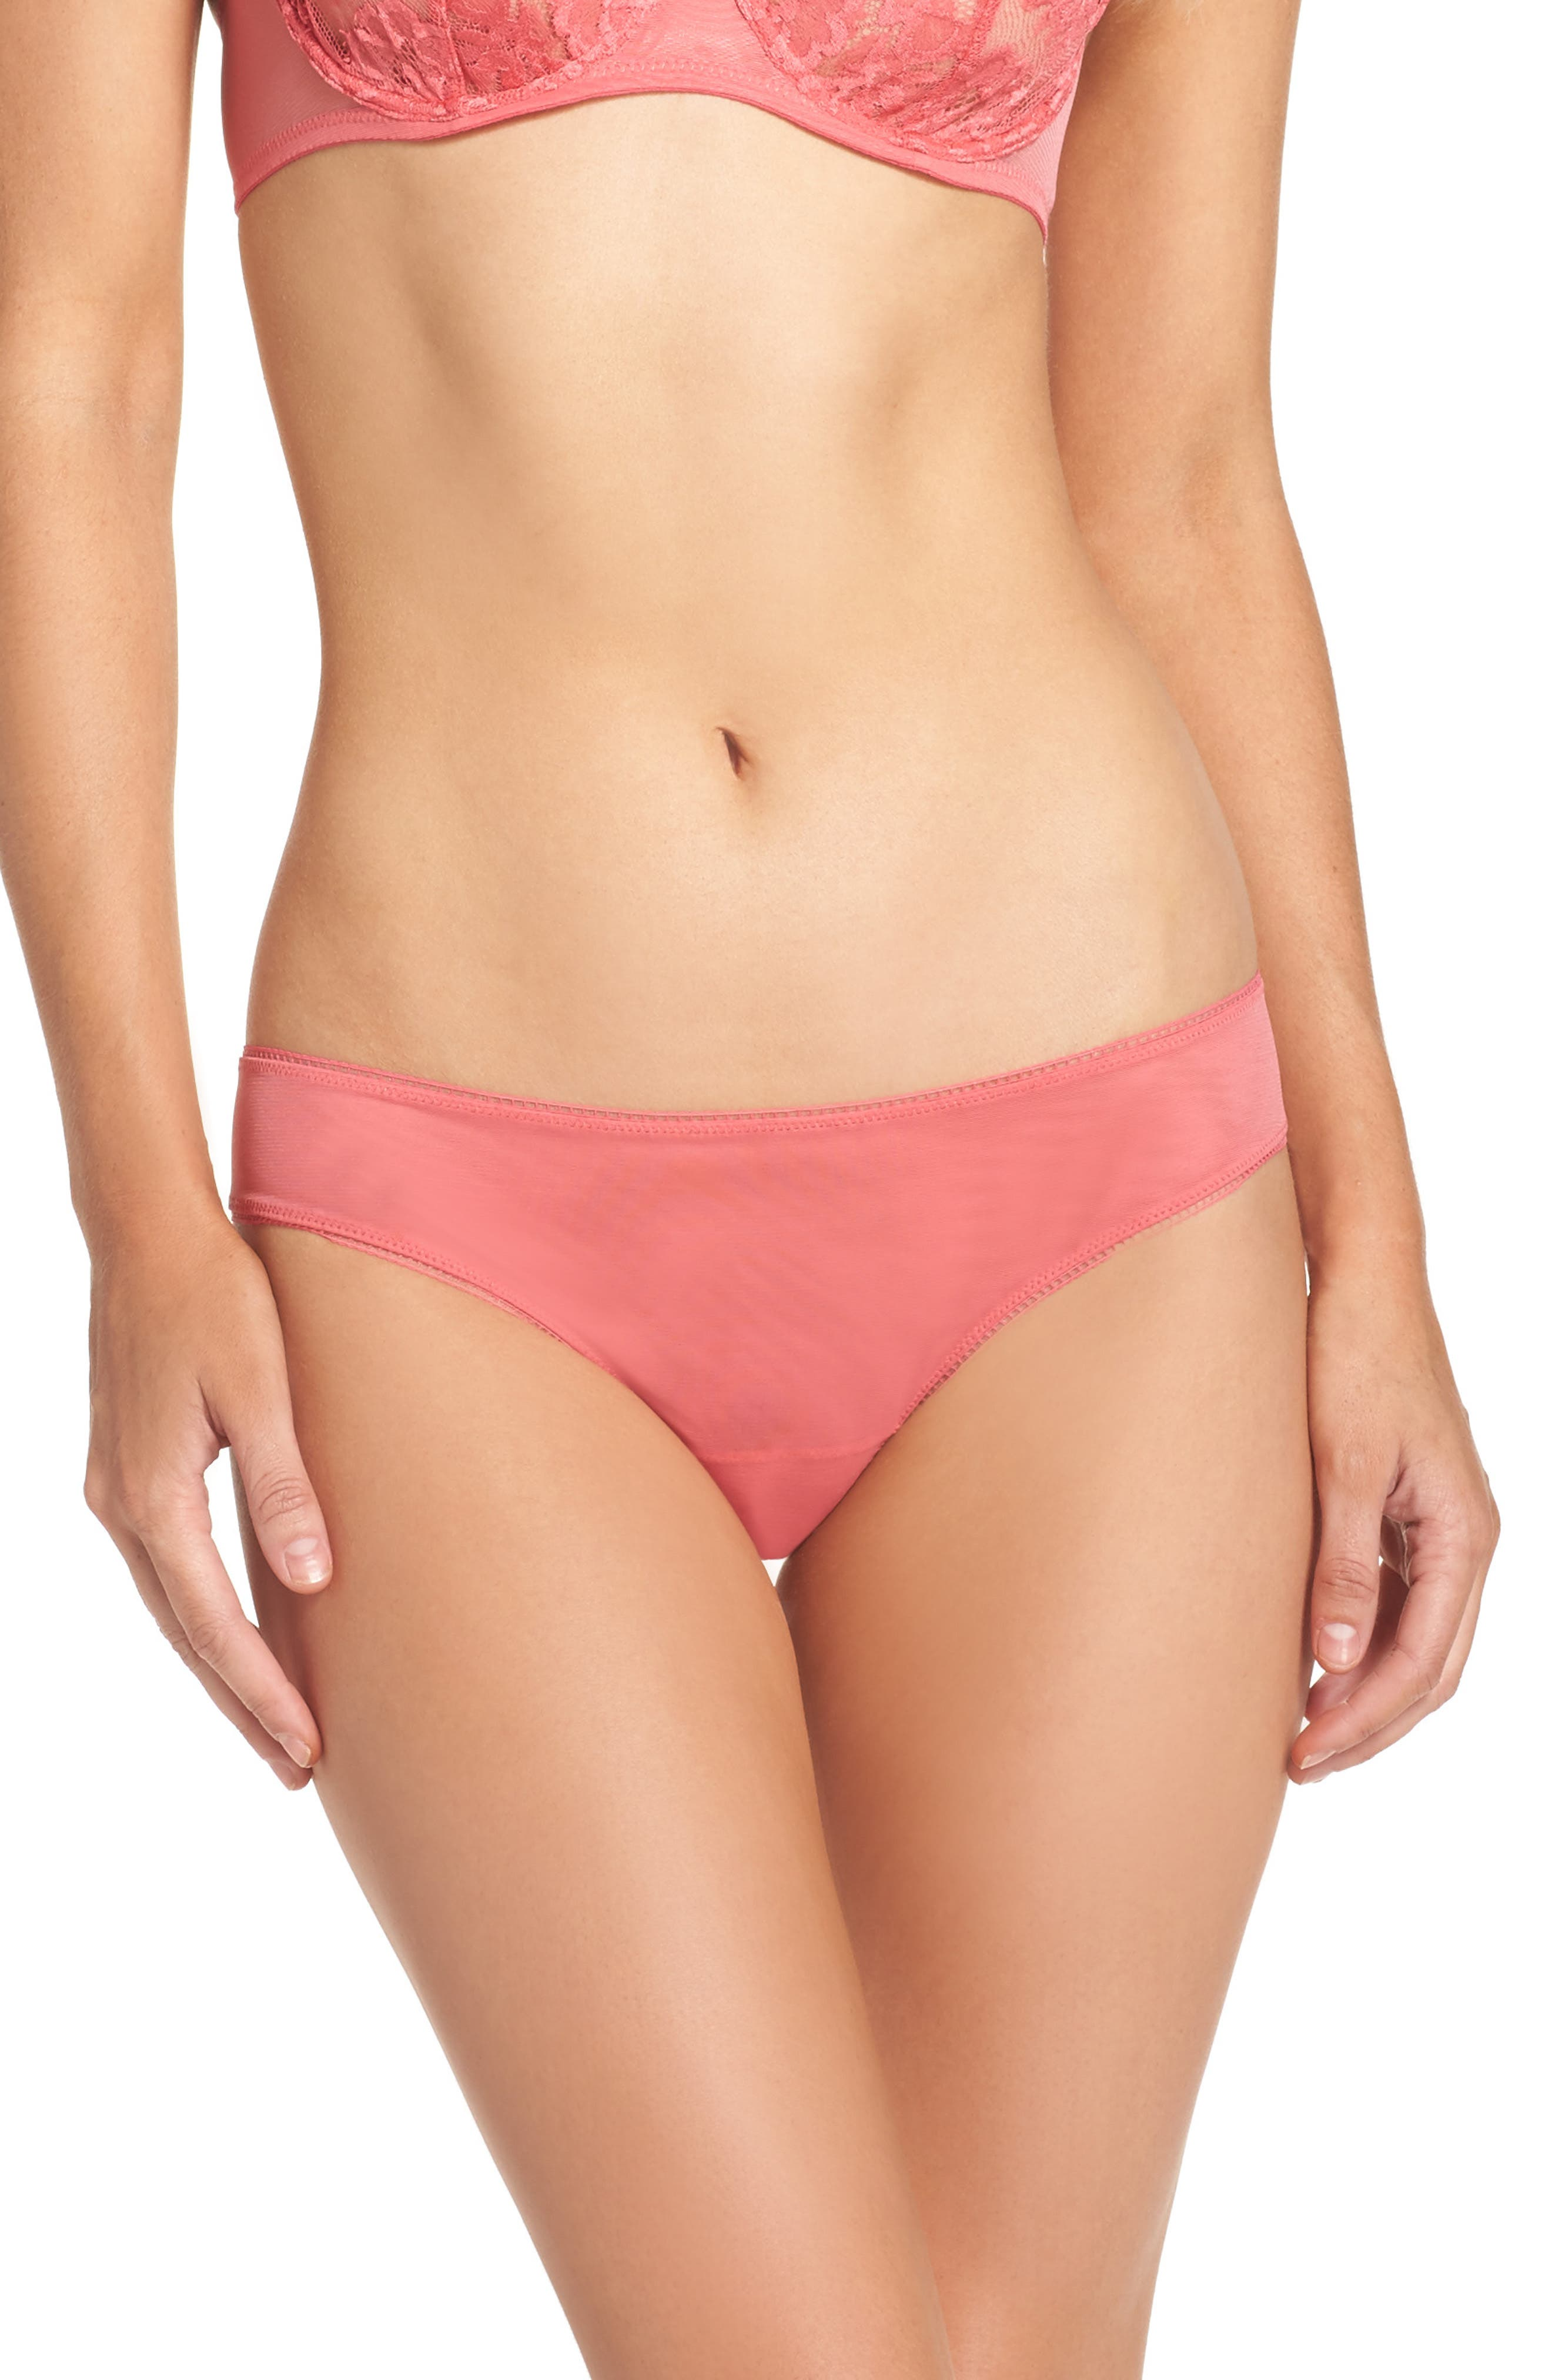 La Perla Primrose Field Brazilian Panties